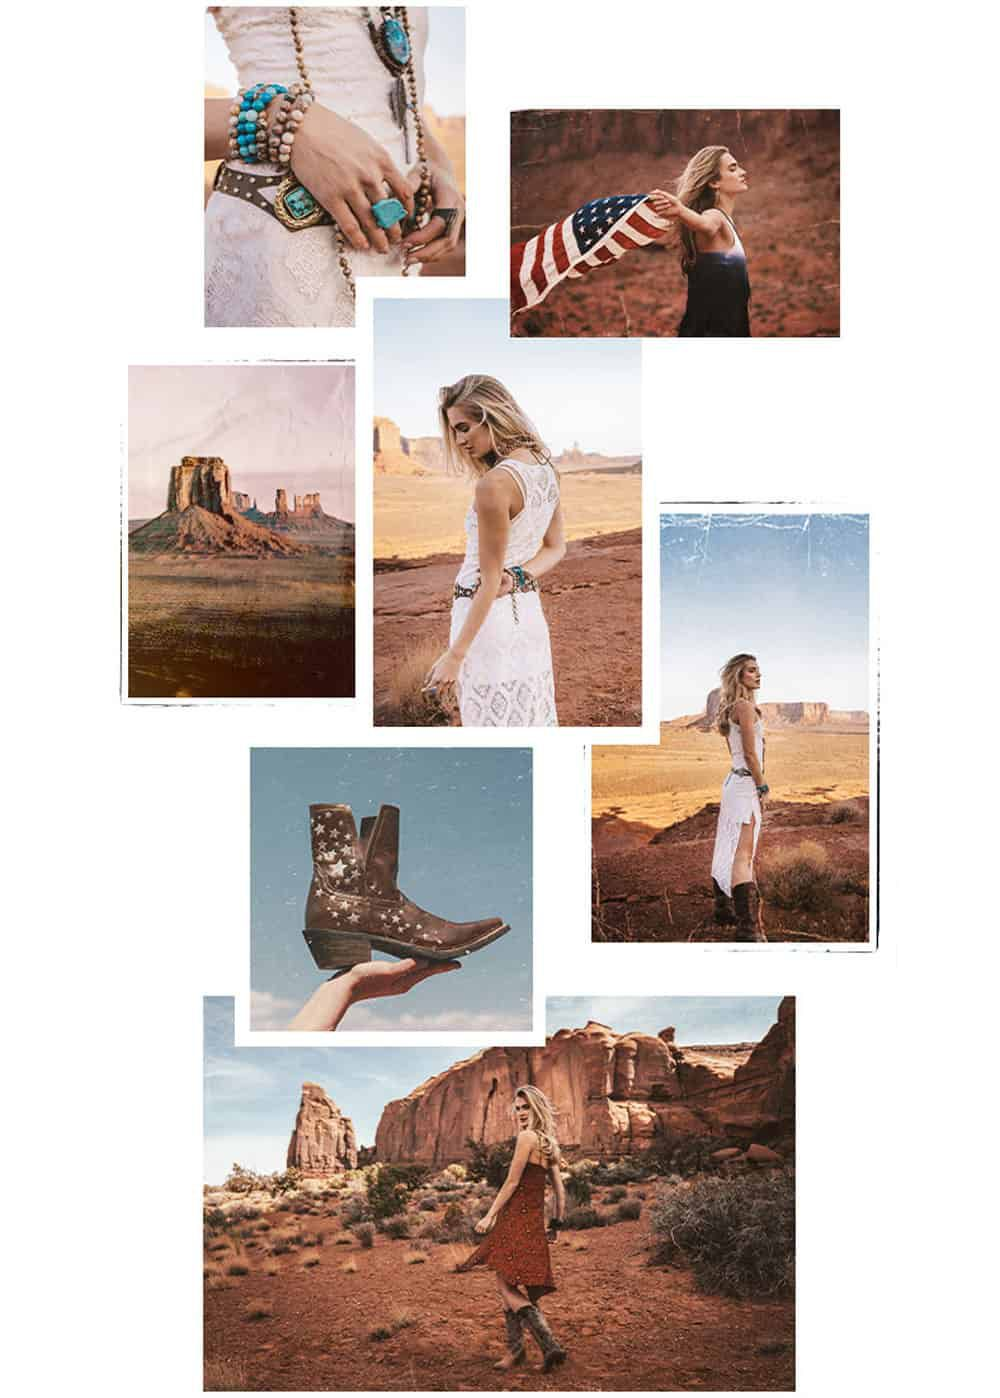 boot barn americana collection cowgirl magazine